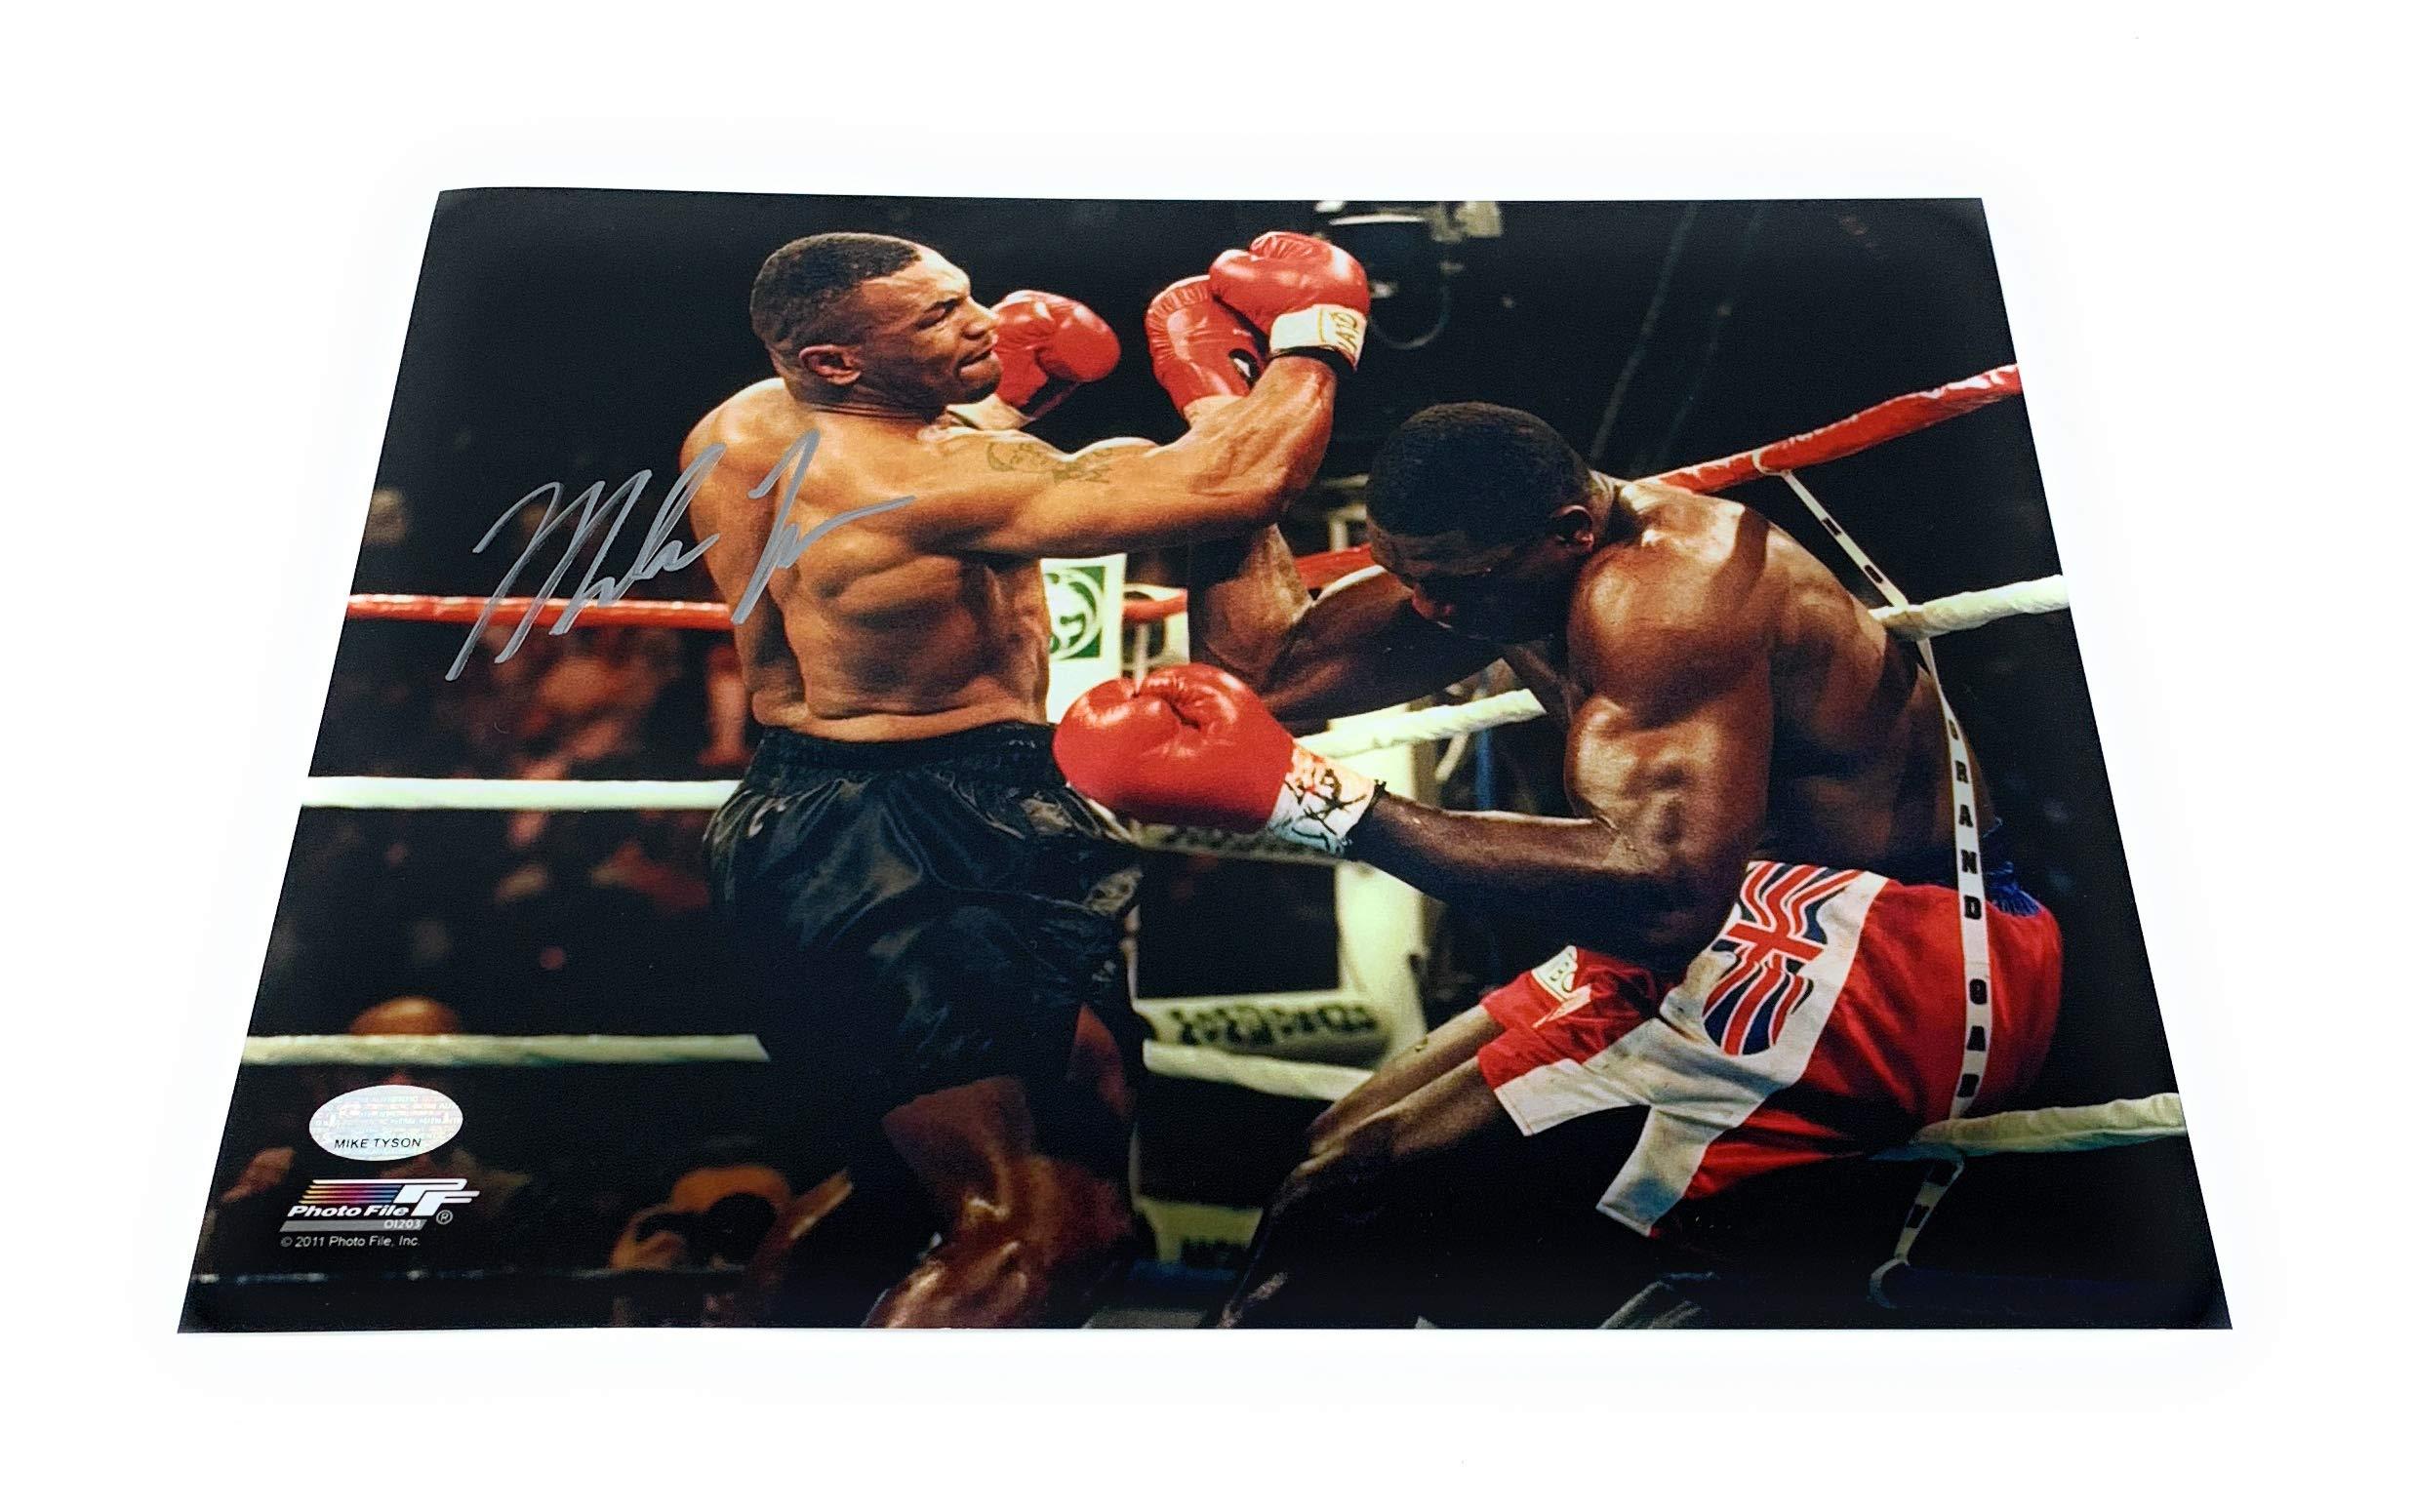 Mike Tyson Boxing Signed Autograph 8x10 Photo Photograph Punch Color GTSM Tyson Hologram Certified